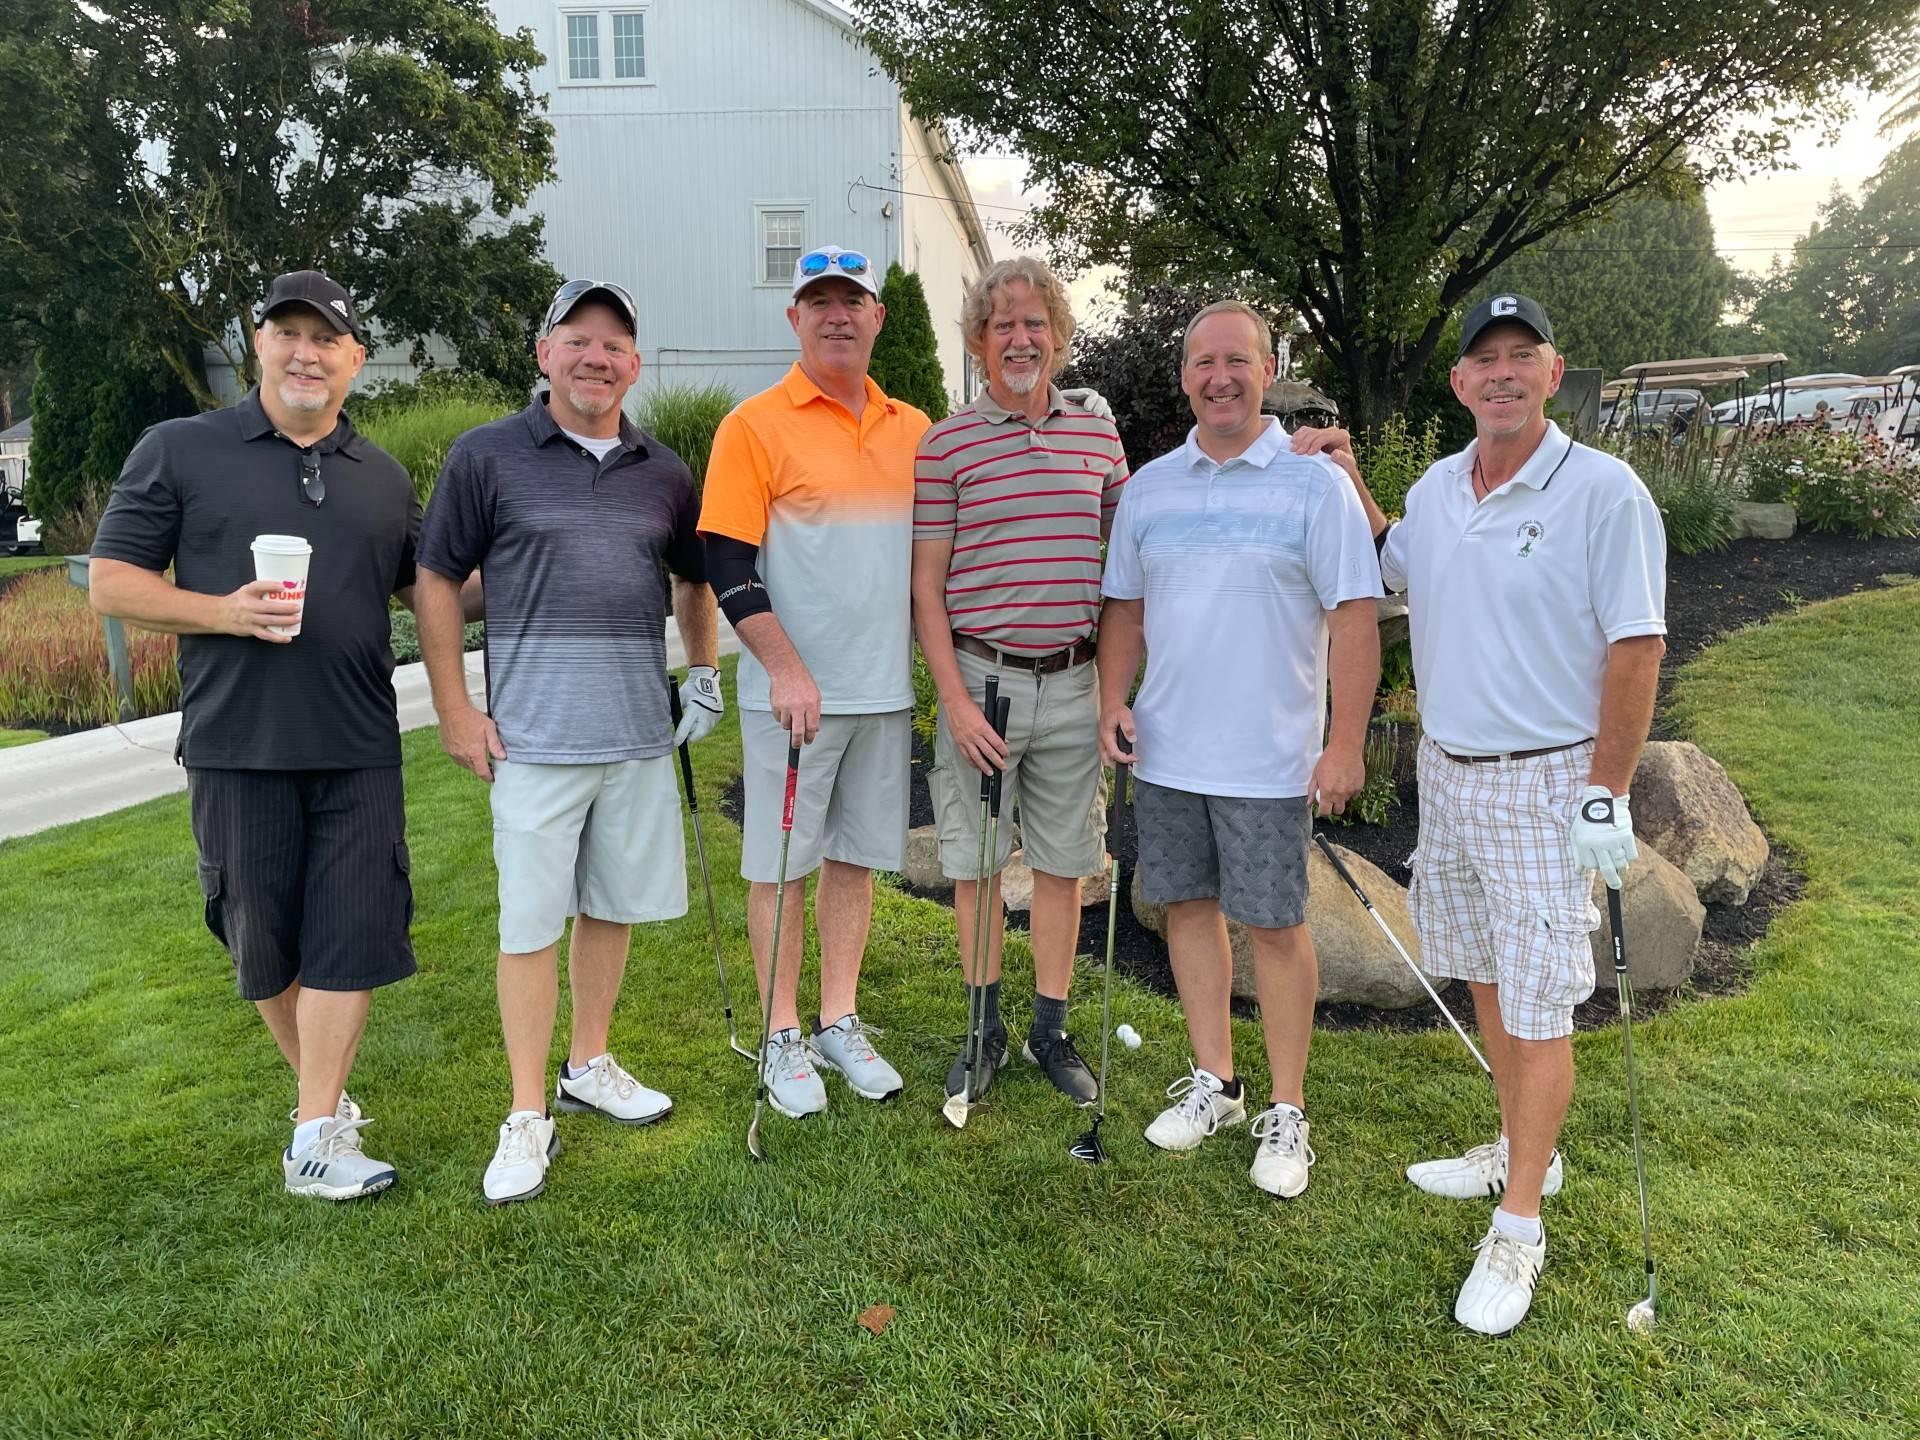 2021 Golf Outing alumni